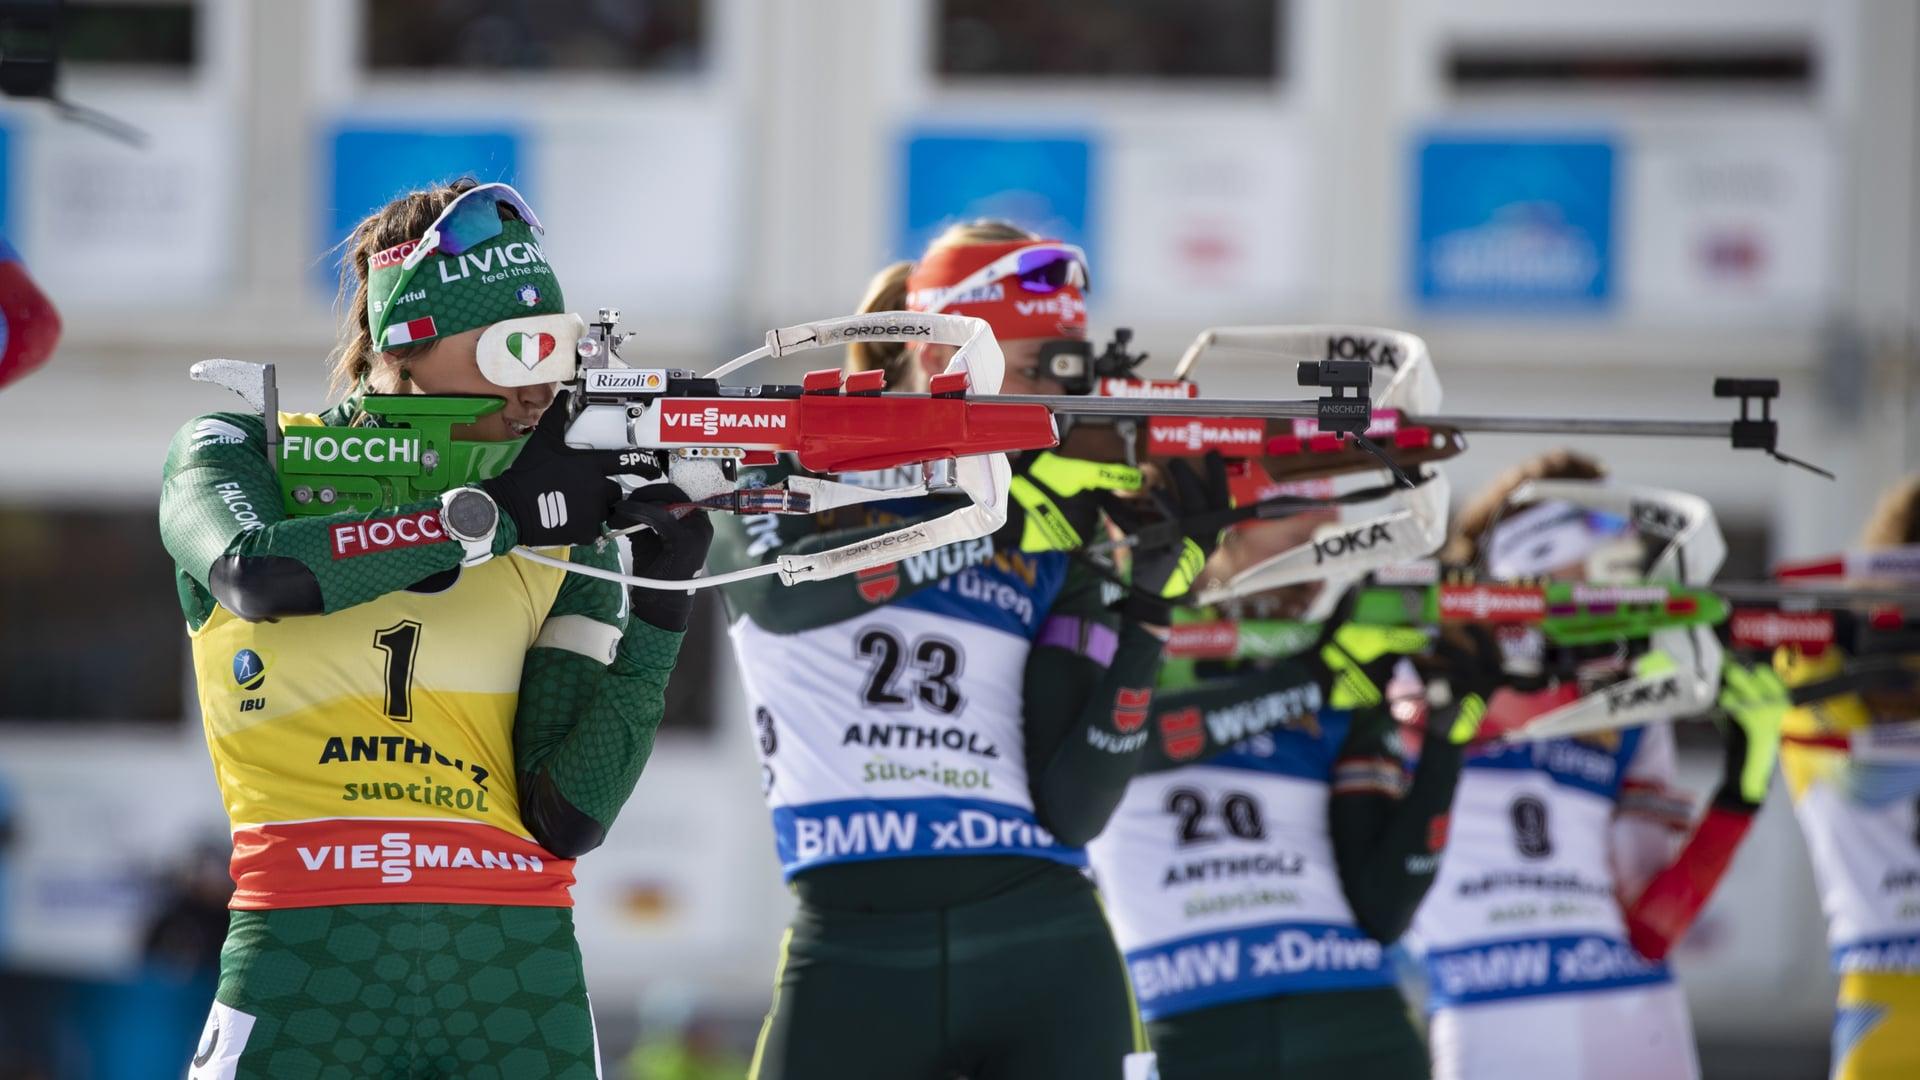 biathlon_2019-2020.jpg (205.13 Kb)